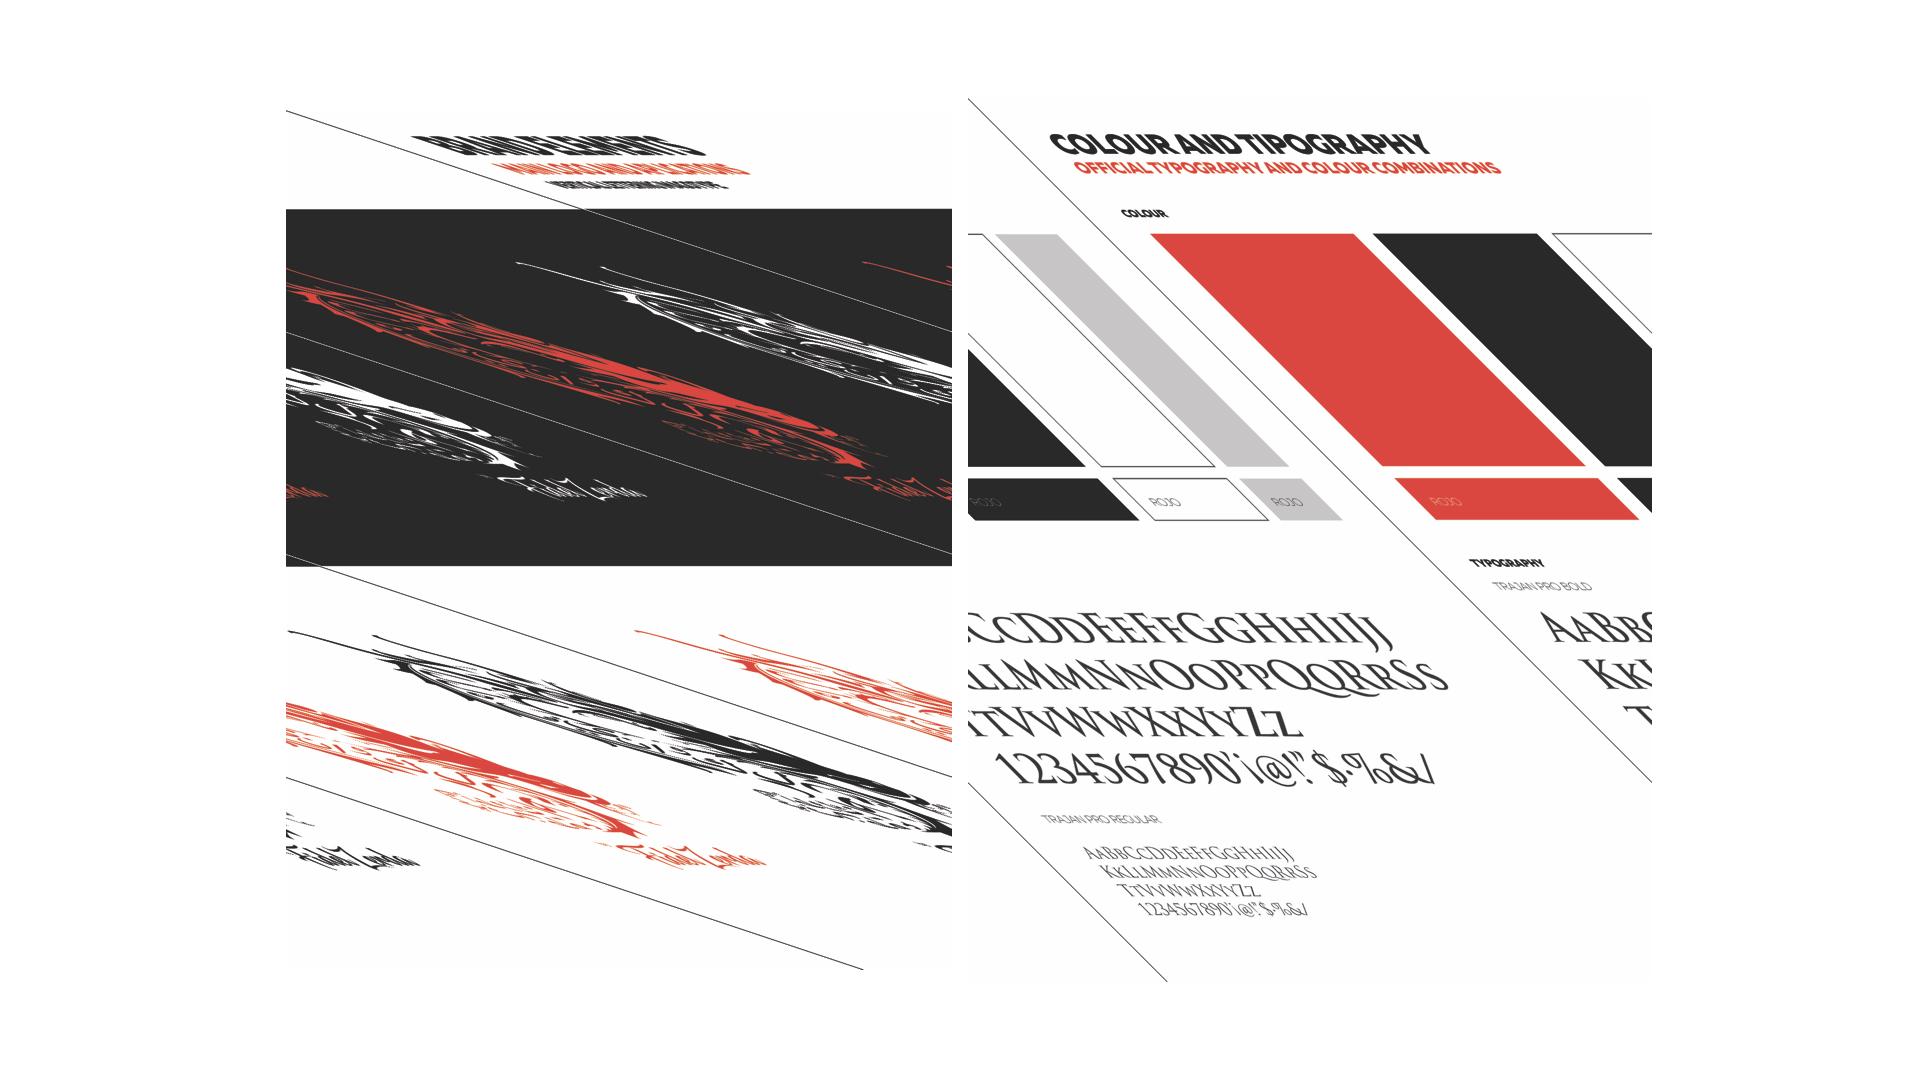 slv-2018 Edit.069.jpeg